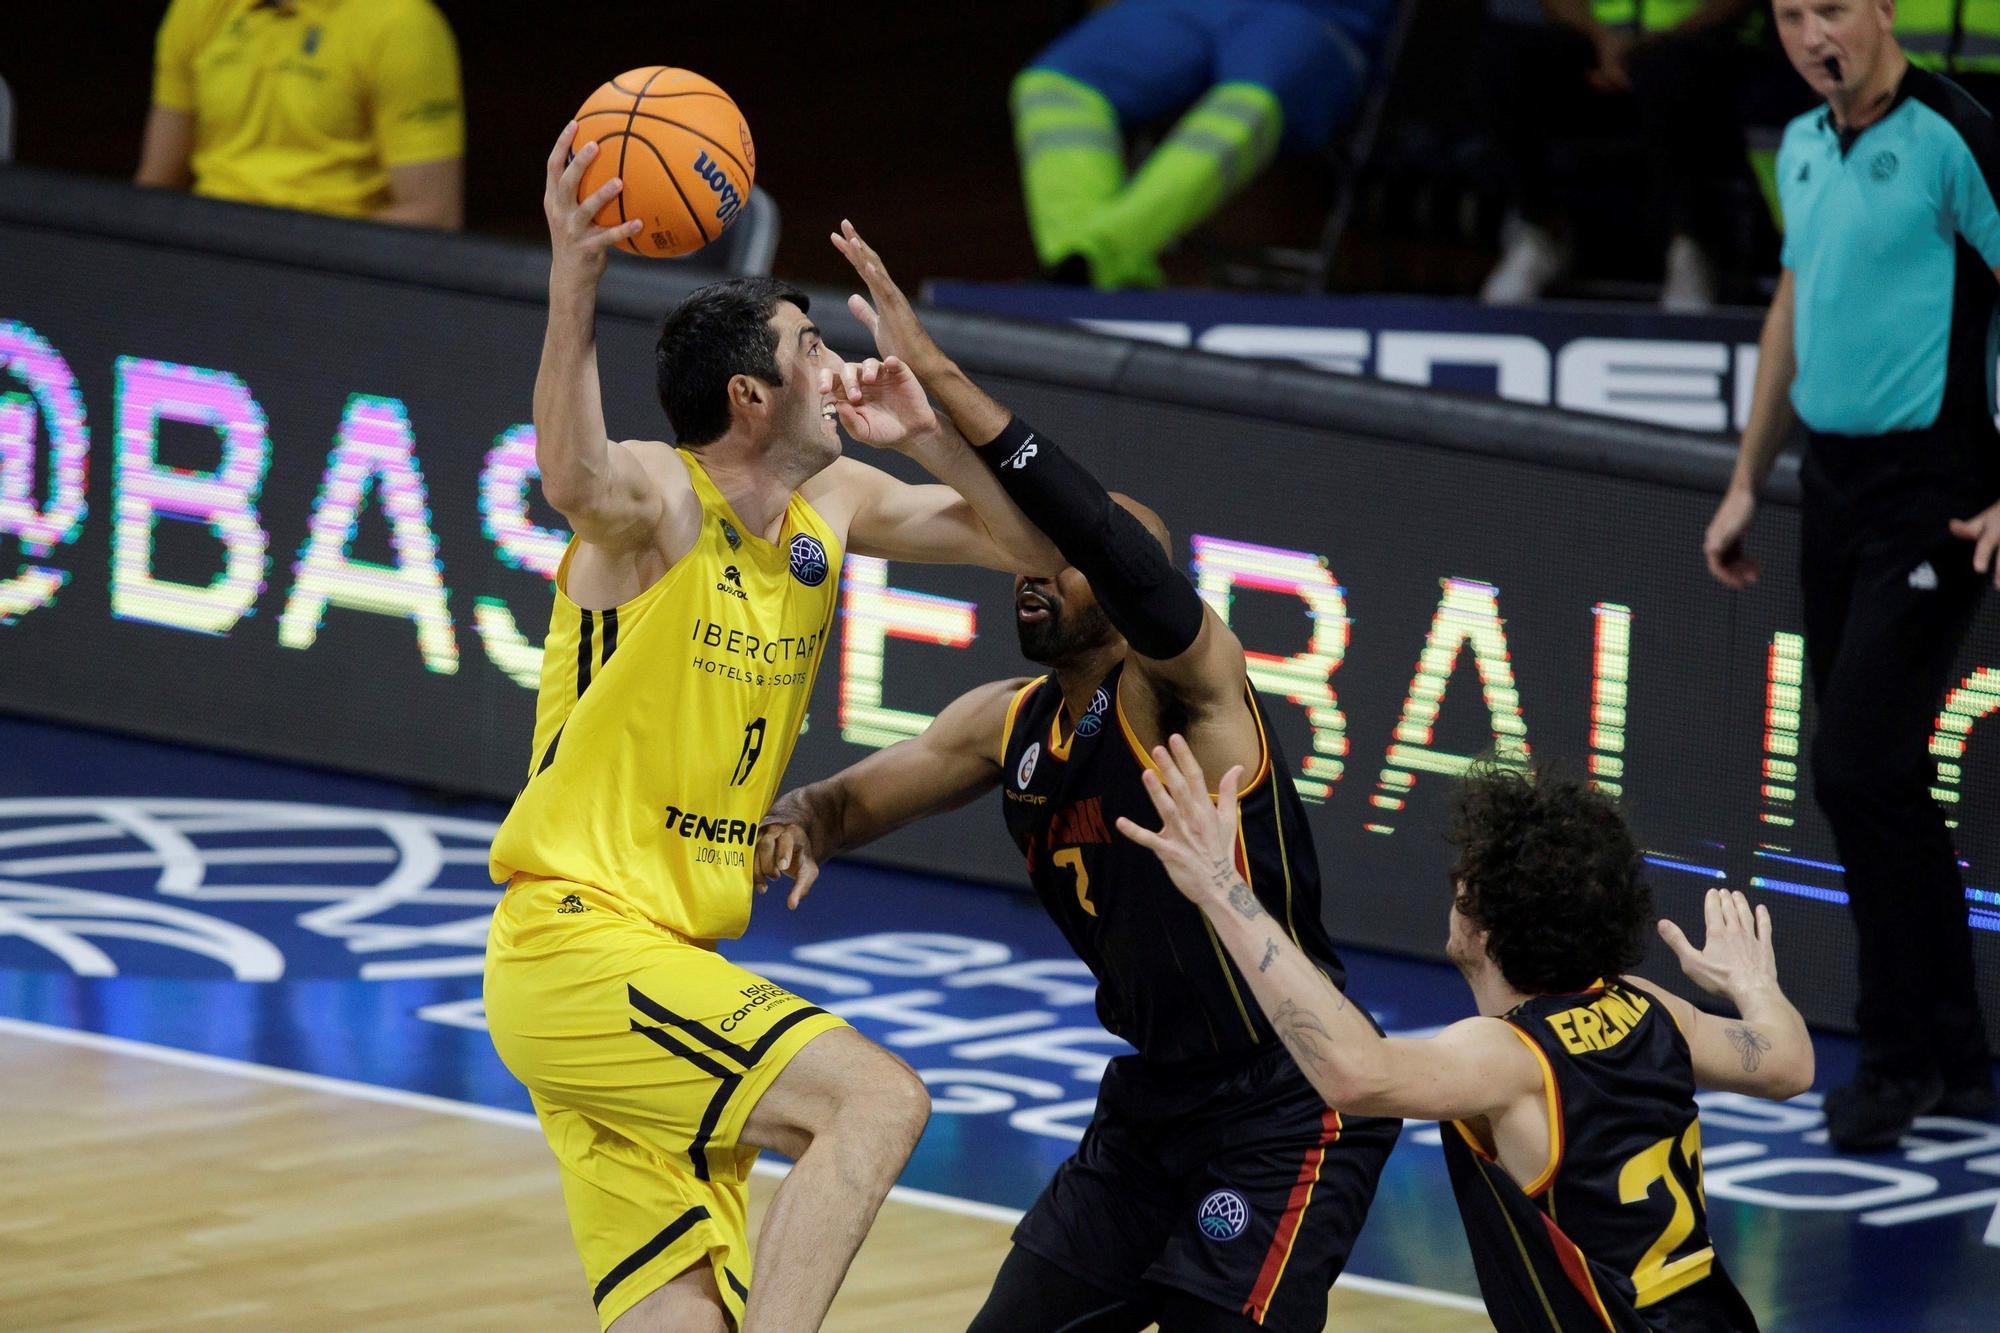 El Iberostar Tenerife gana con solvencia al Galatasaray (85-72)